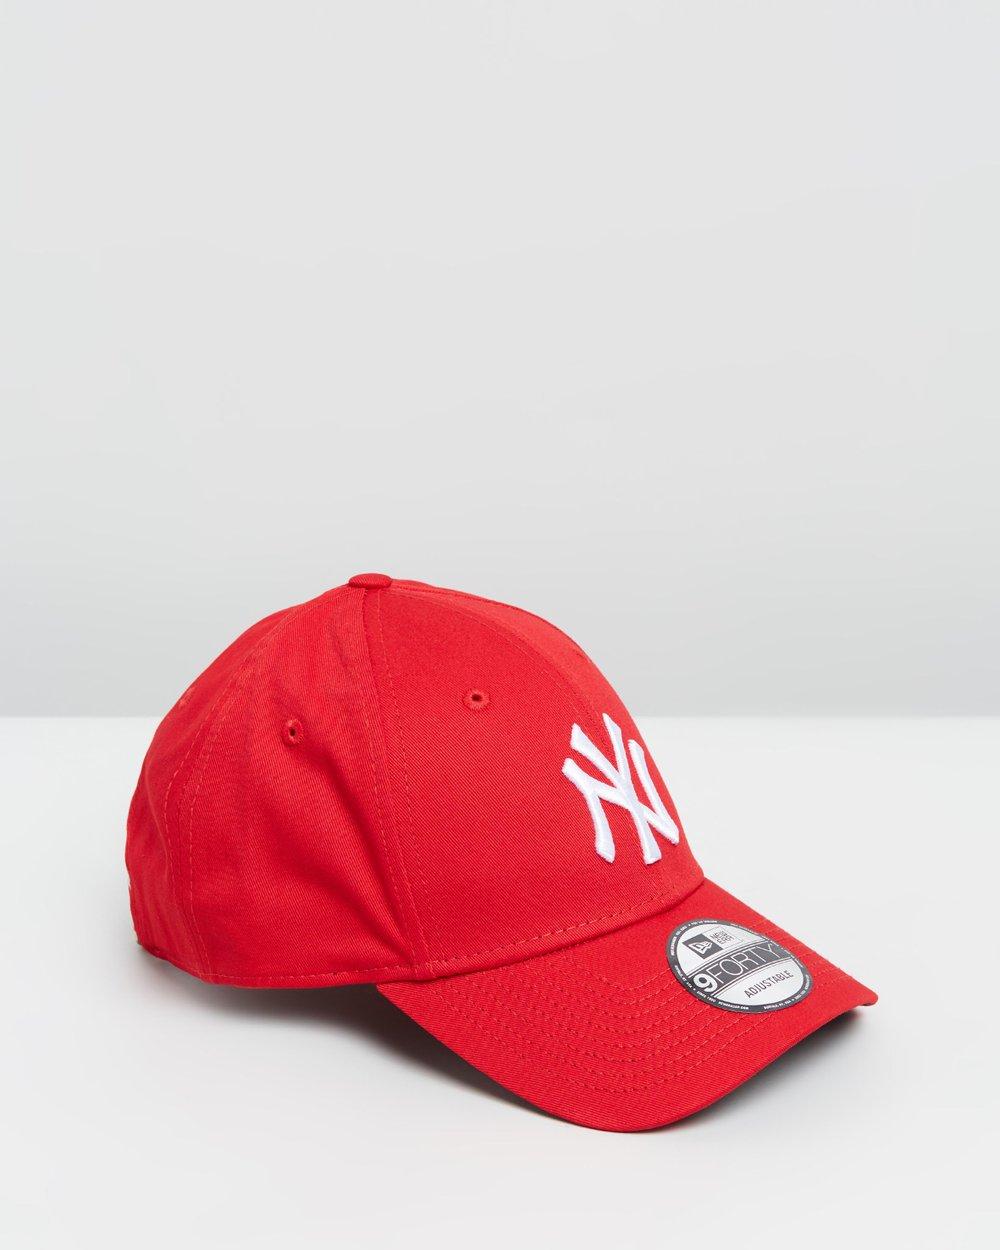 info for c0177 d7592 940CS New York Yankees Cap by New Era Online   THE ICONIC   Australia